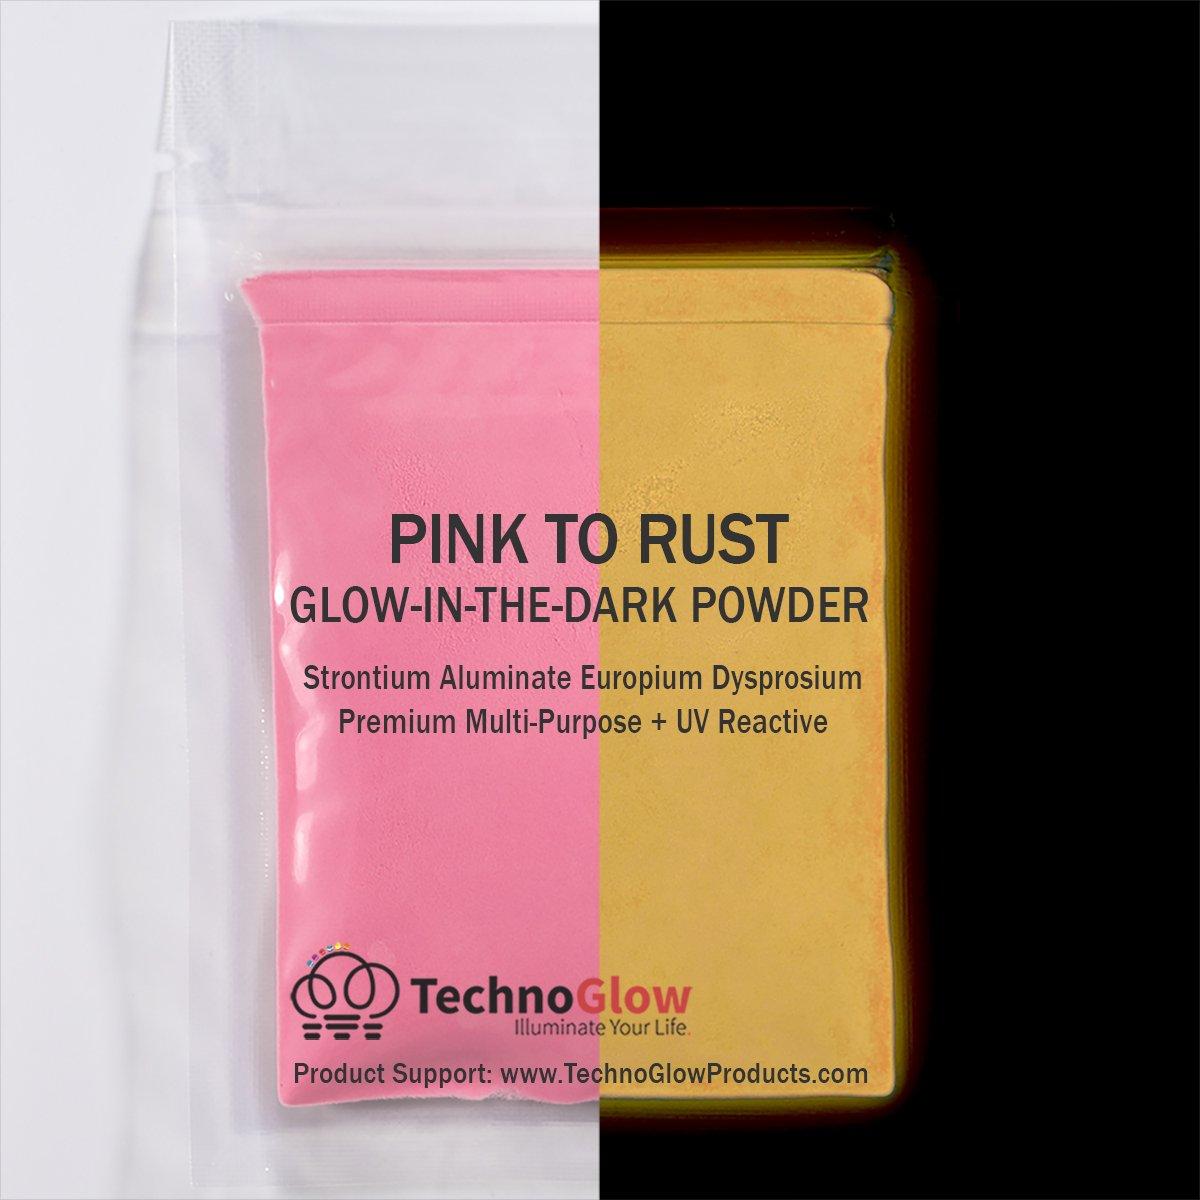 Pink Glow in the Dark & UV Powder (8 OZ)